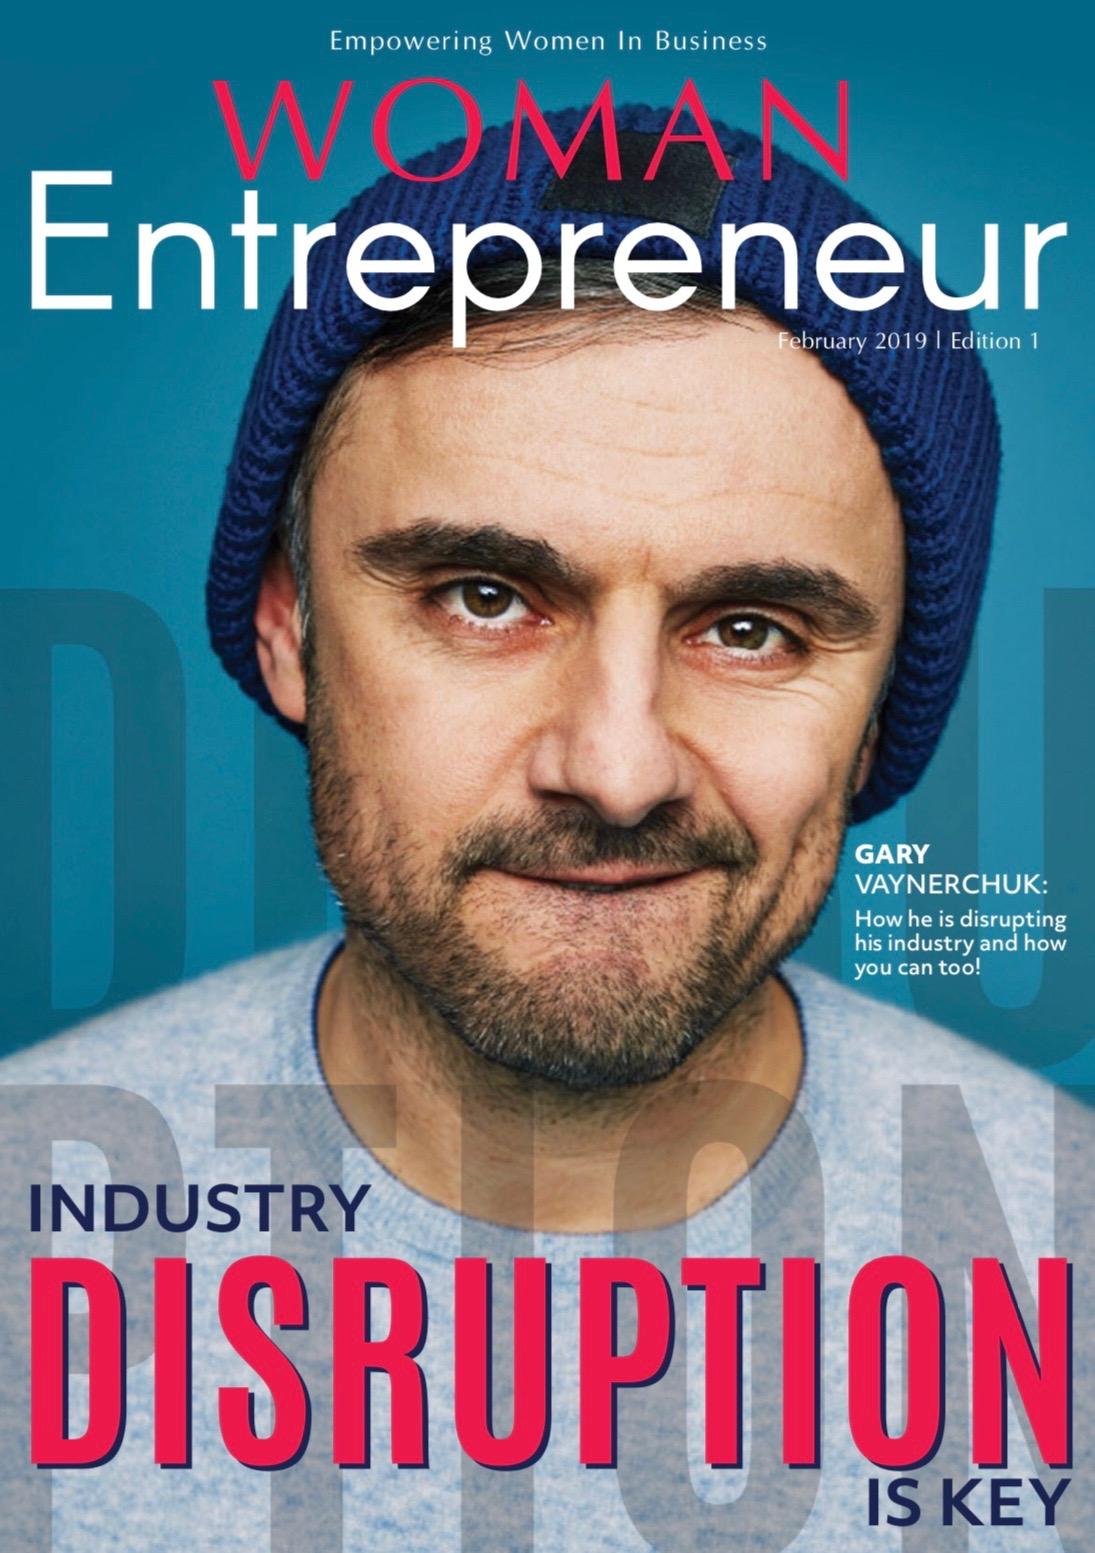 Woman Entrepreneur Gary Vee Cover  February Edition.JPG